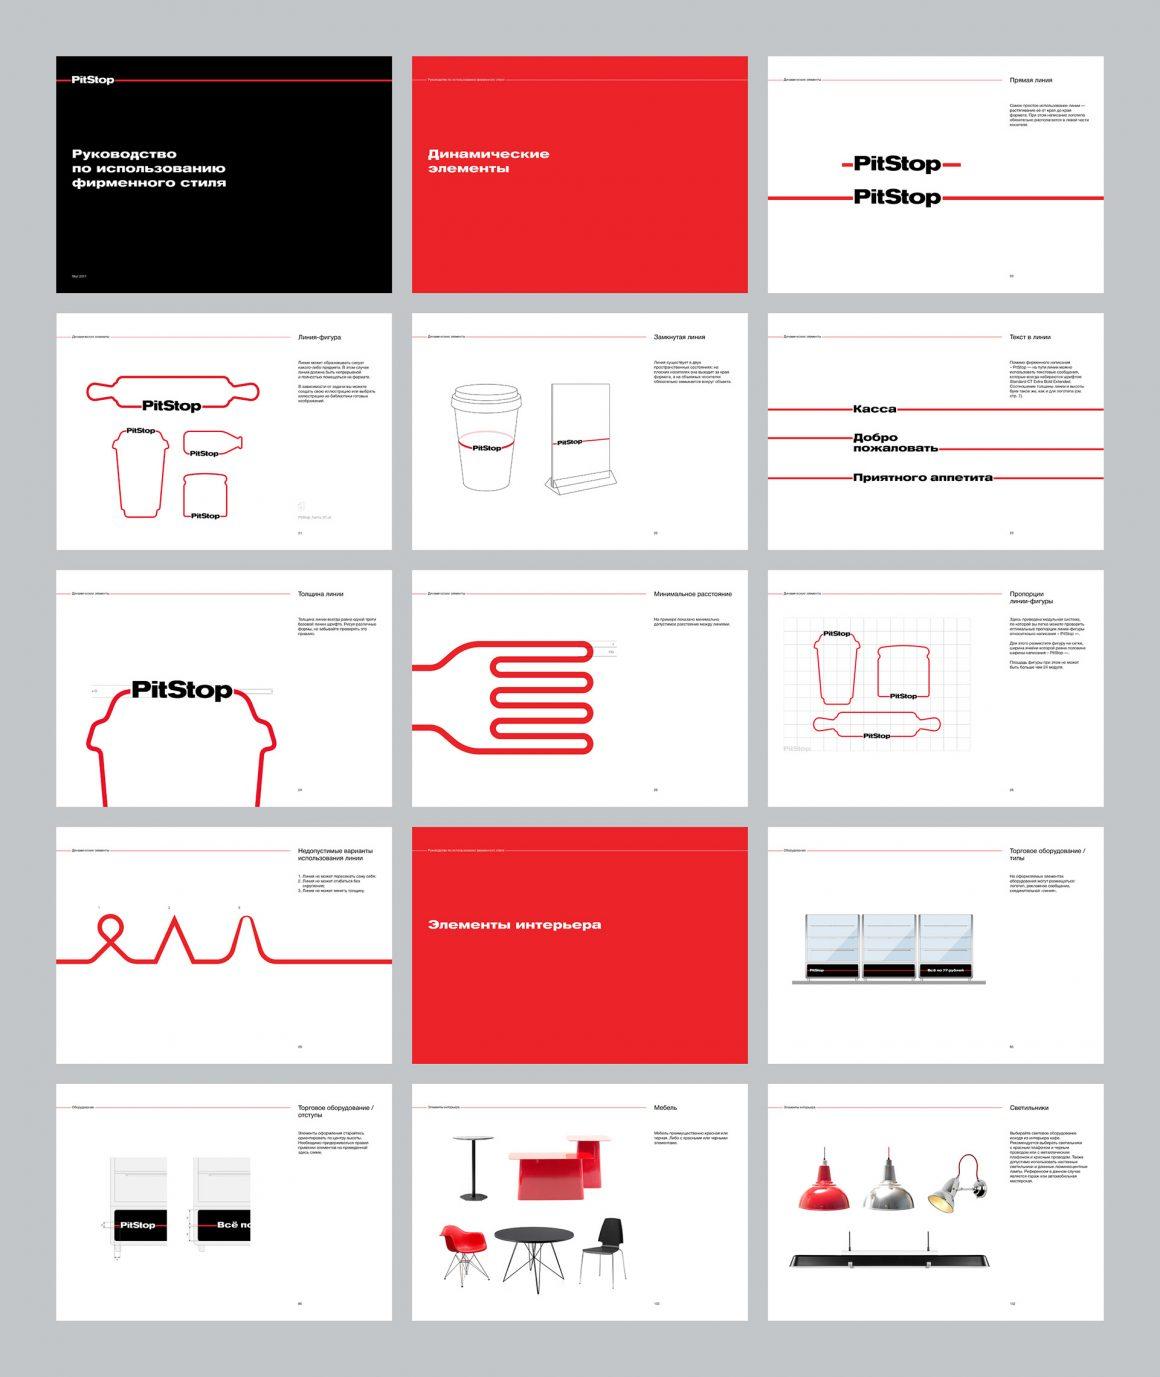 PitStop - Tomatdesign - identidade visual - Boteco Design